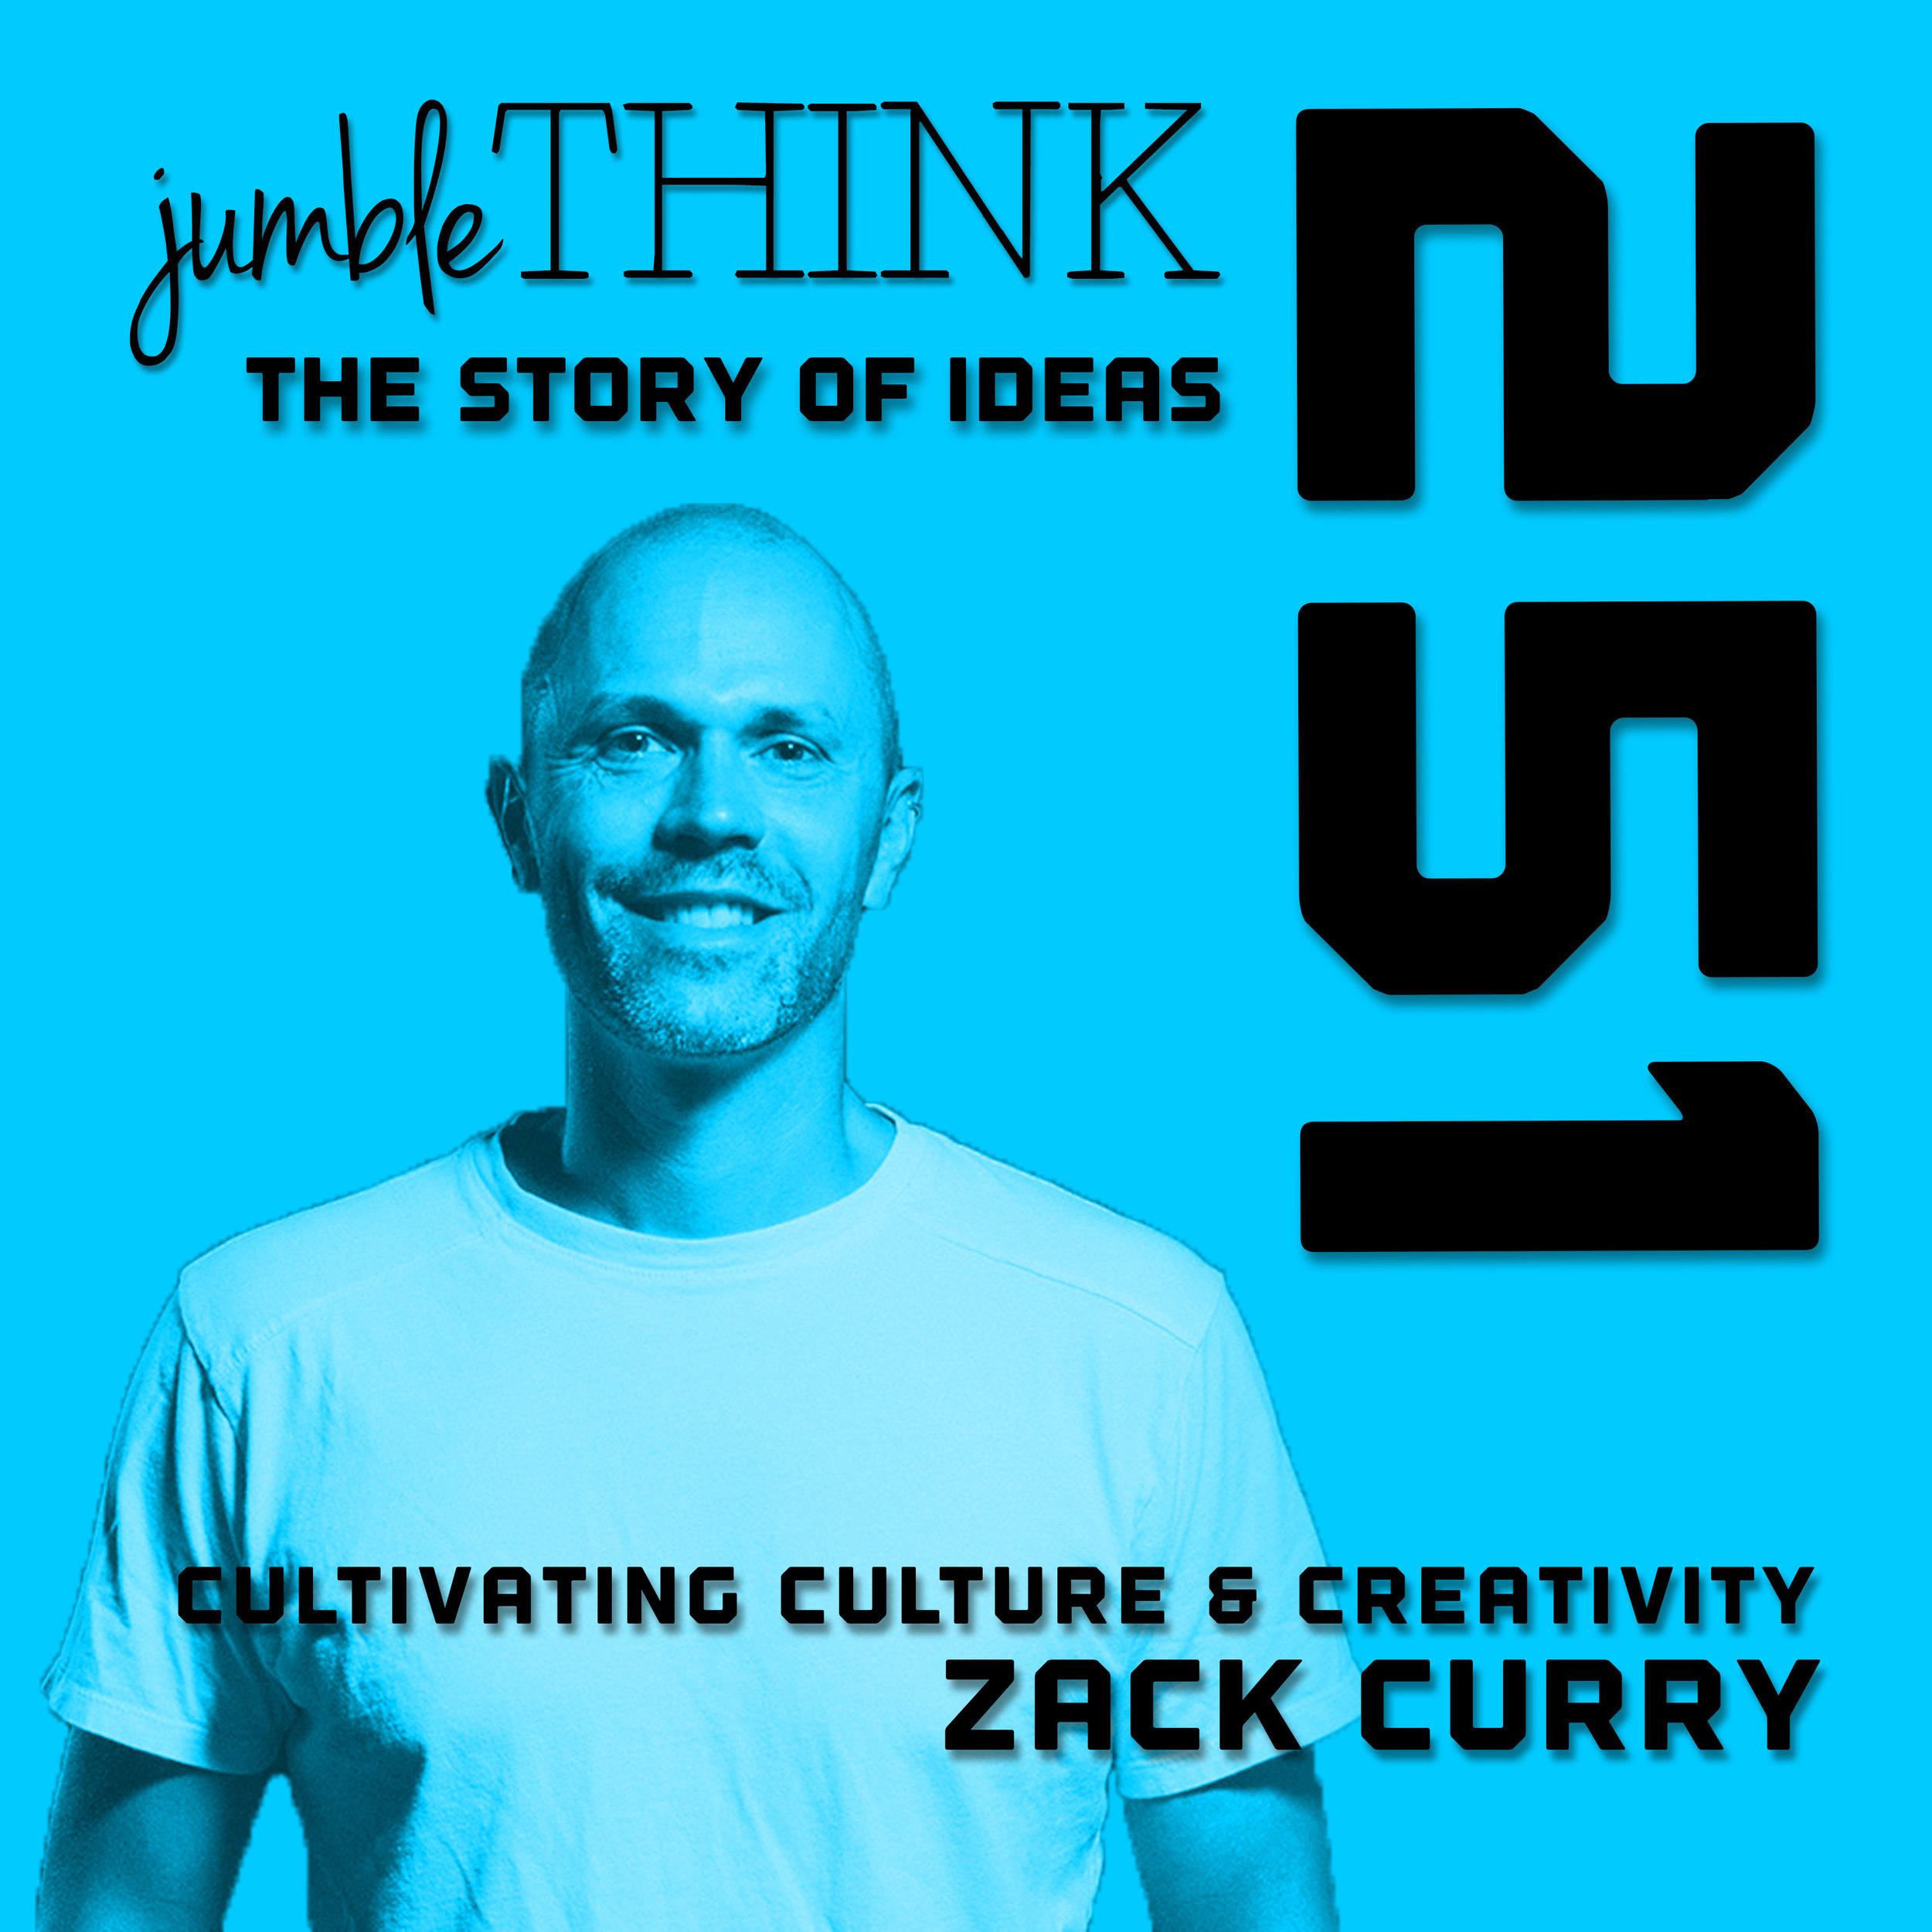 Cultivating Culture & Creativity